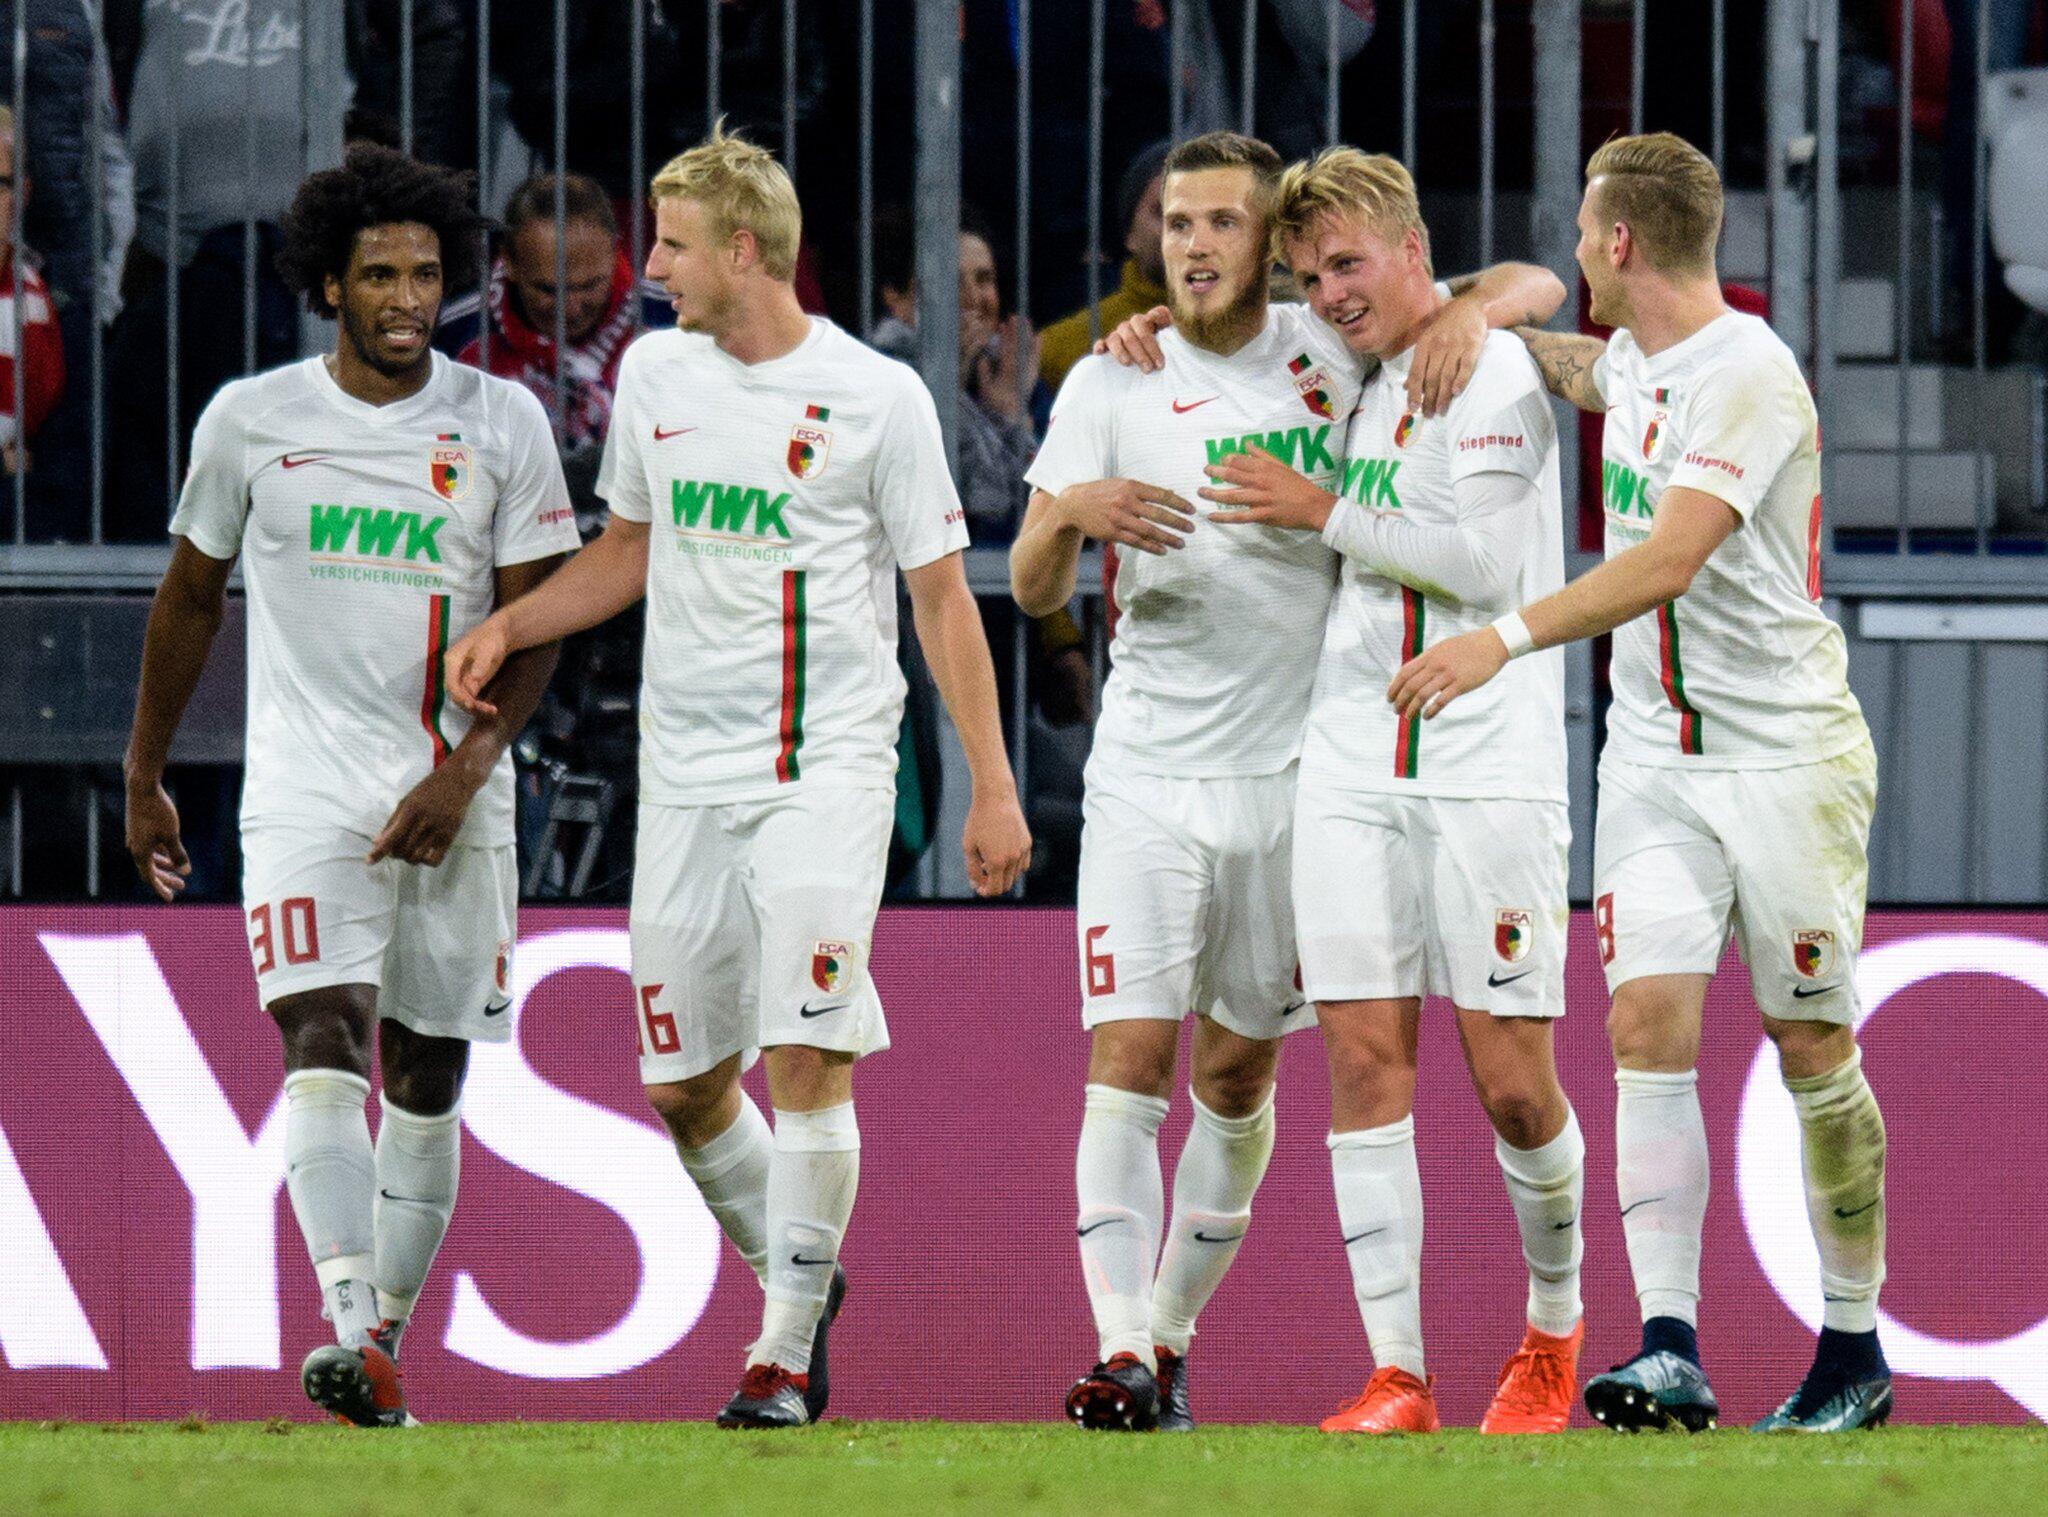 Bild zu Bayern München - FC Augsburg, Bundesliga, Felix Götze